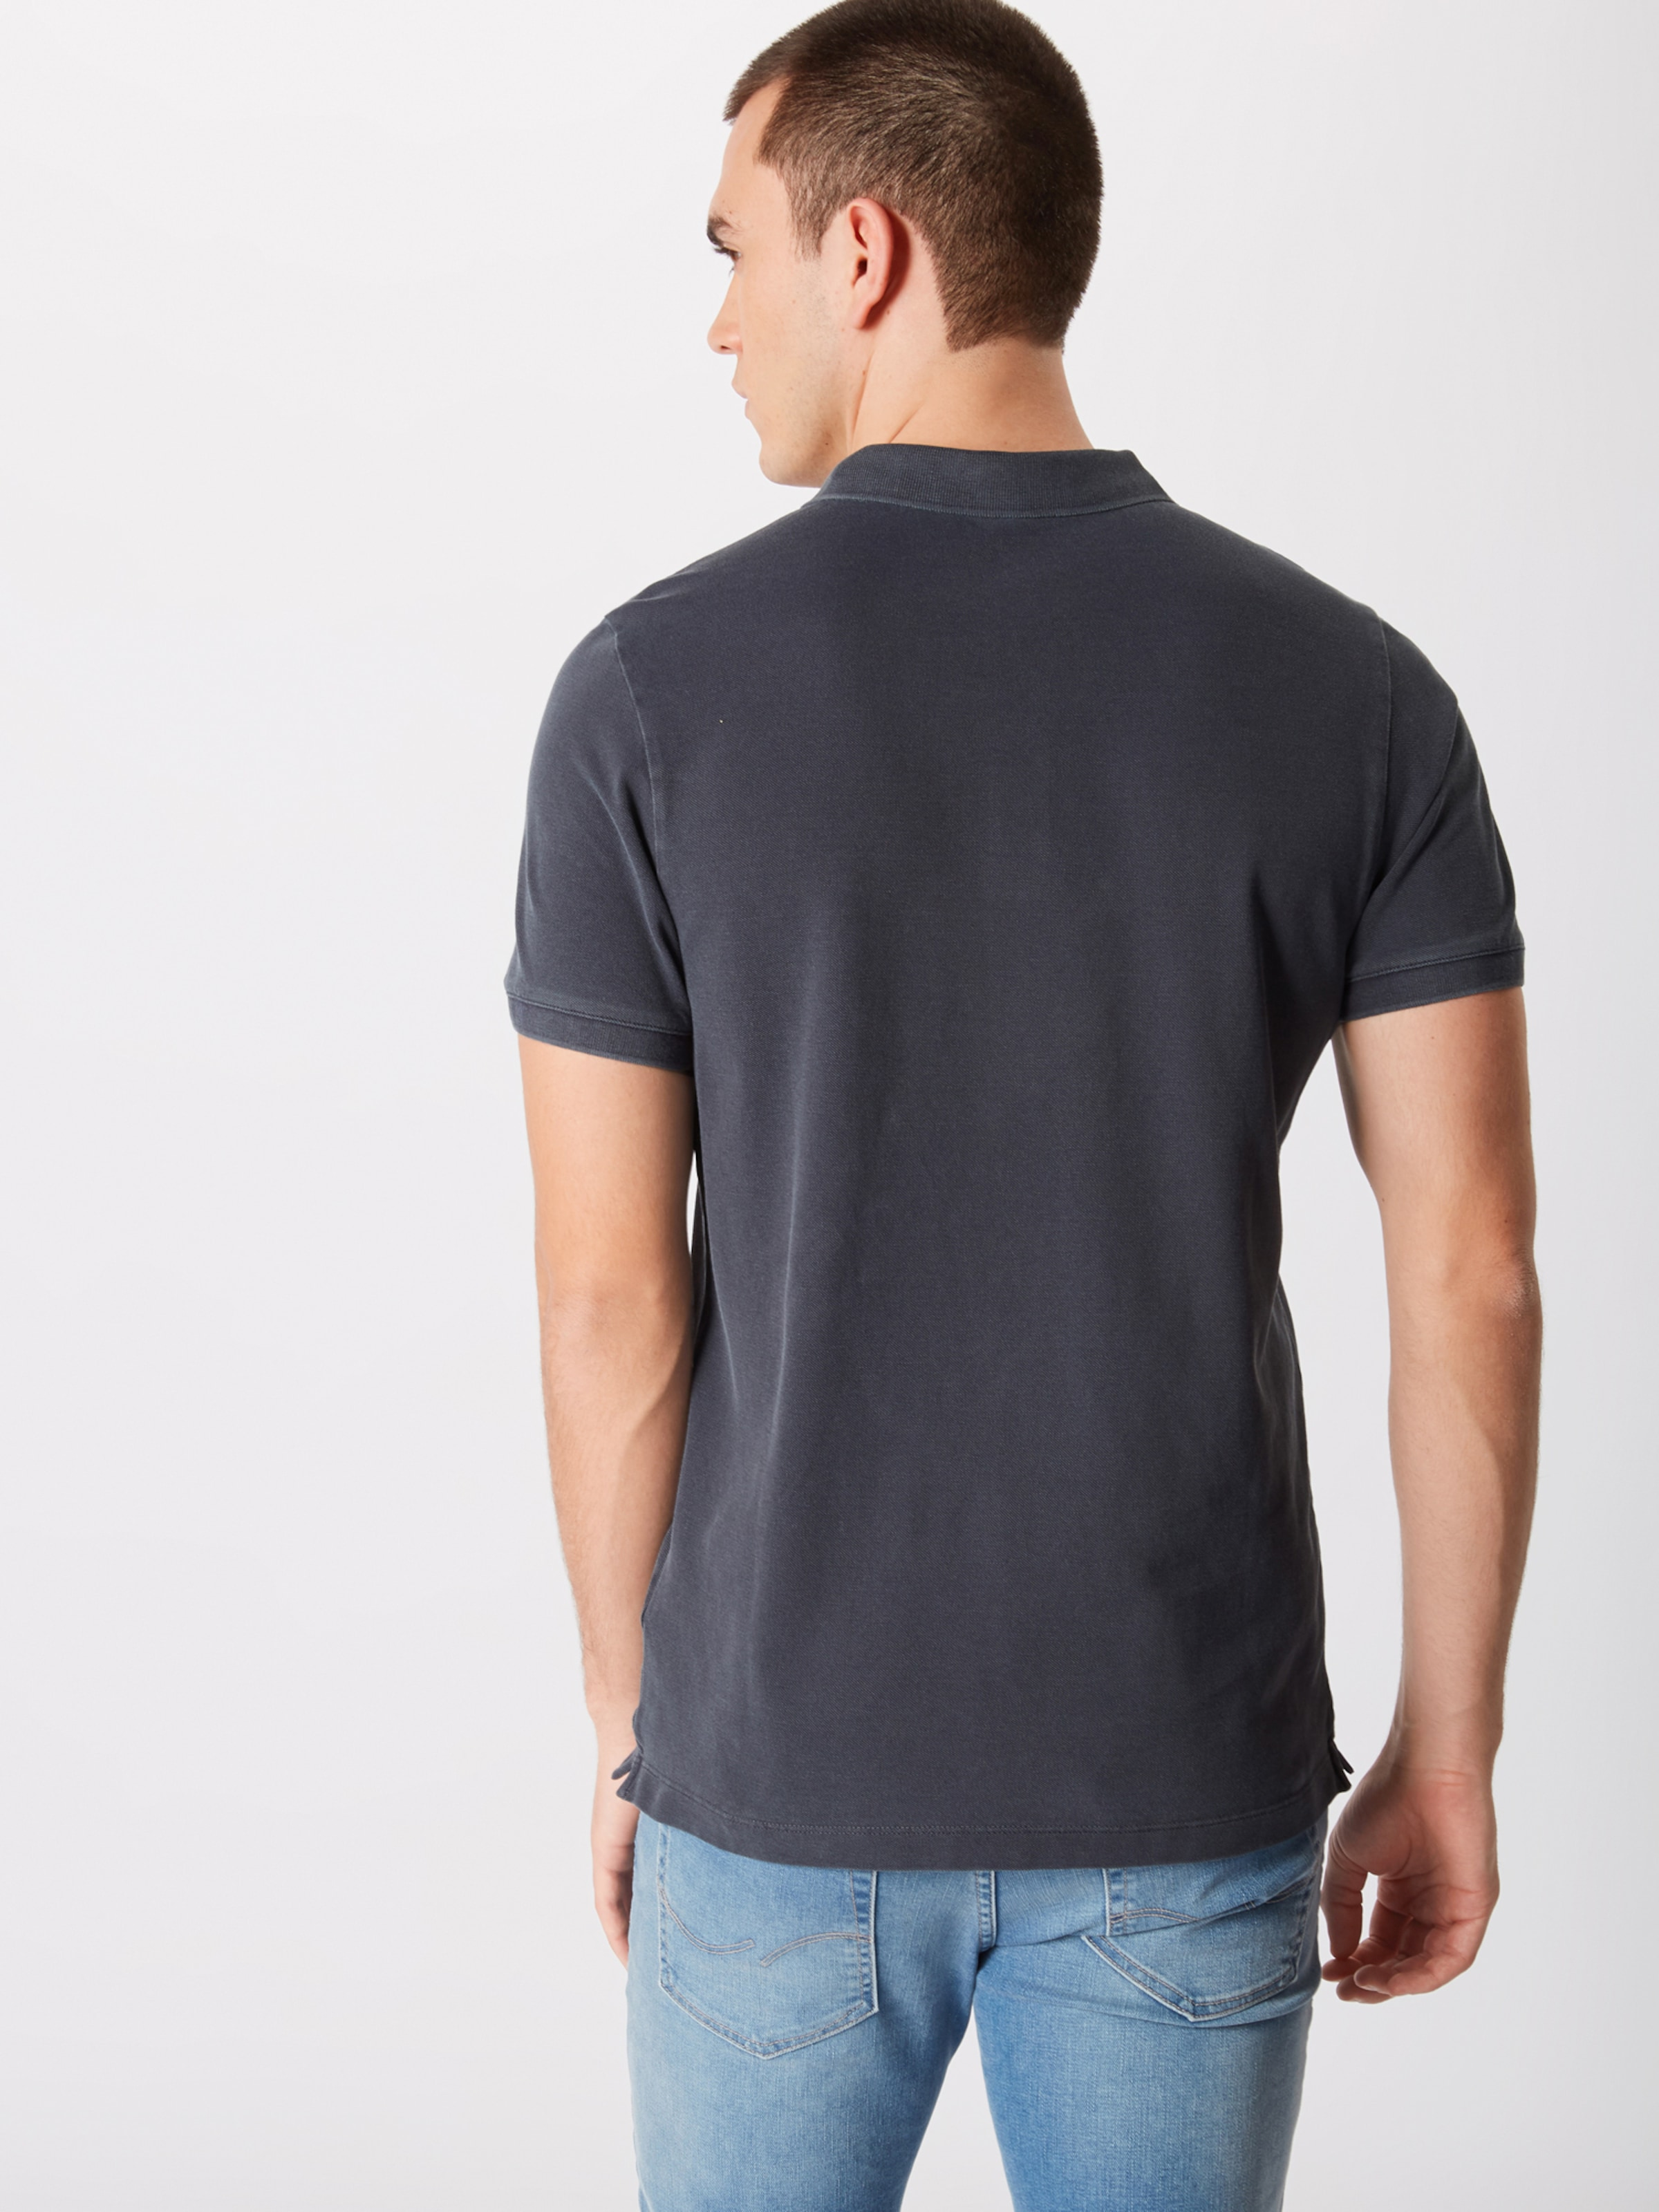 '11 ping' Strellson shirt J T En Bleu Foncé WH2ED9IYe